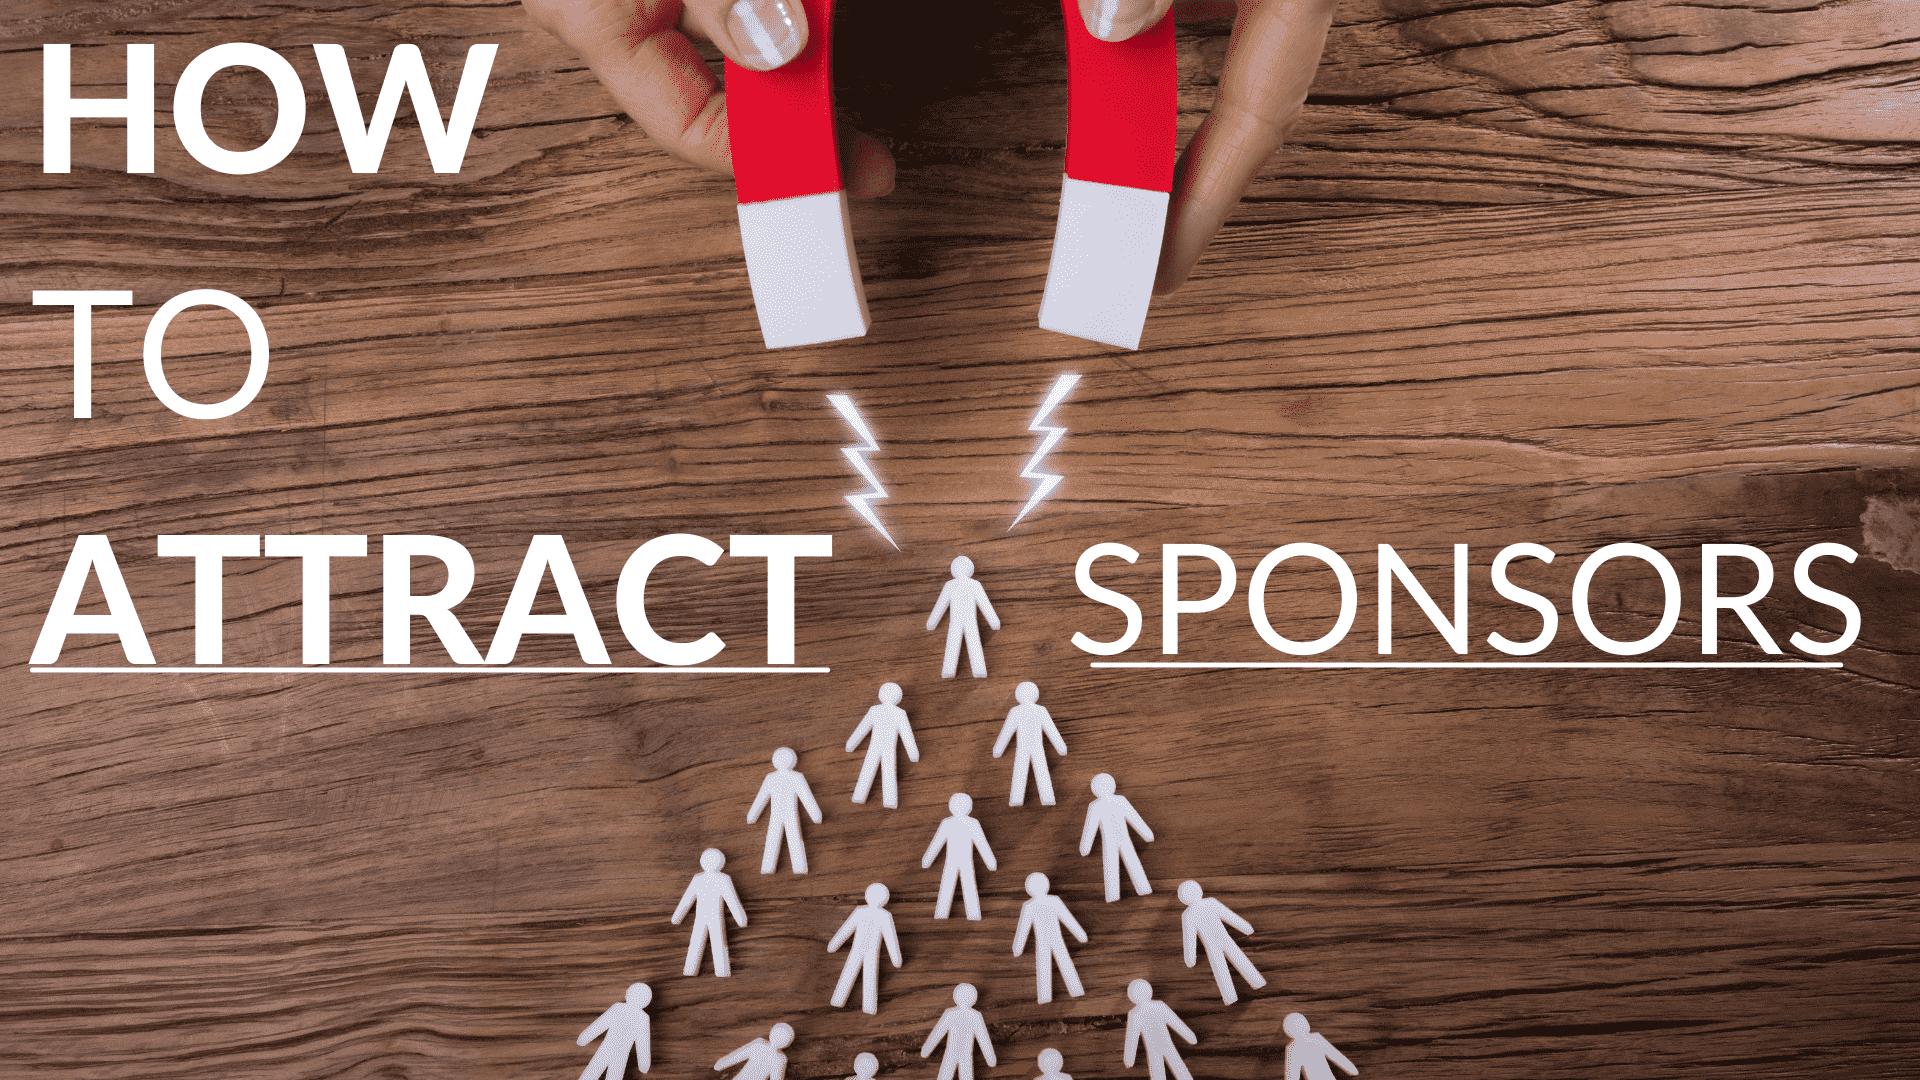 Attracting sponsors